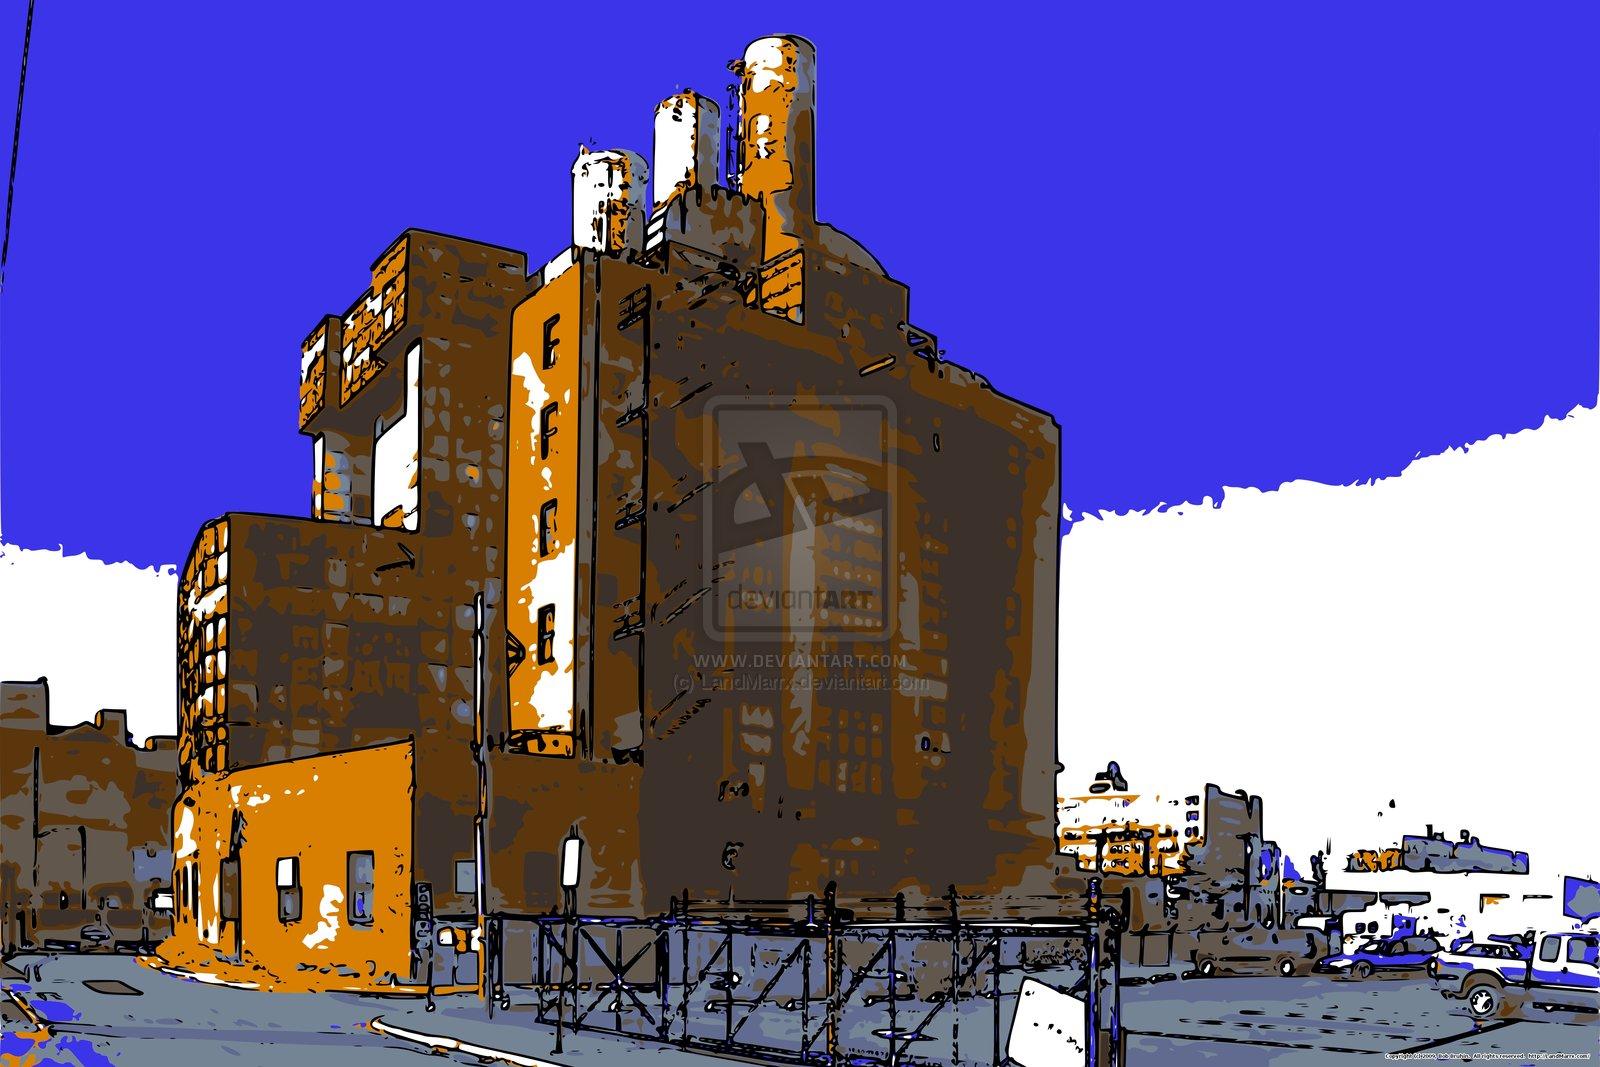 Steam Dreams III by LandMarrx on deviantART